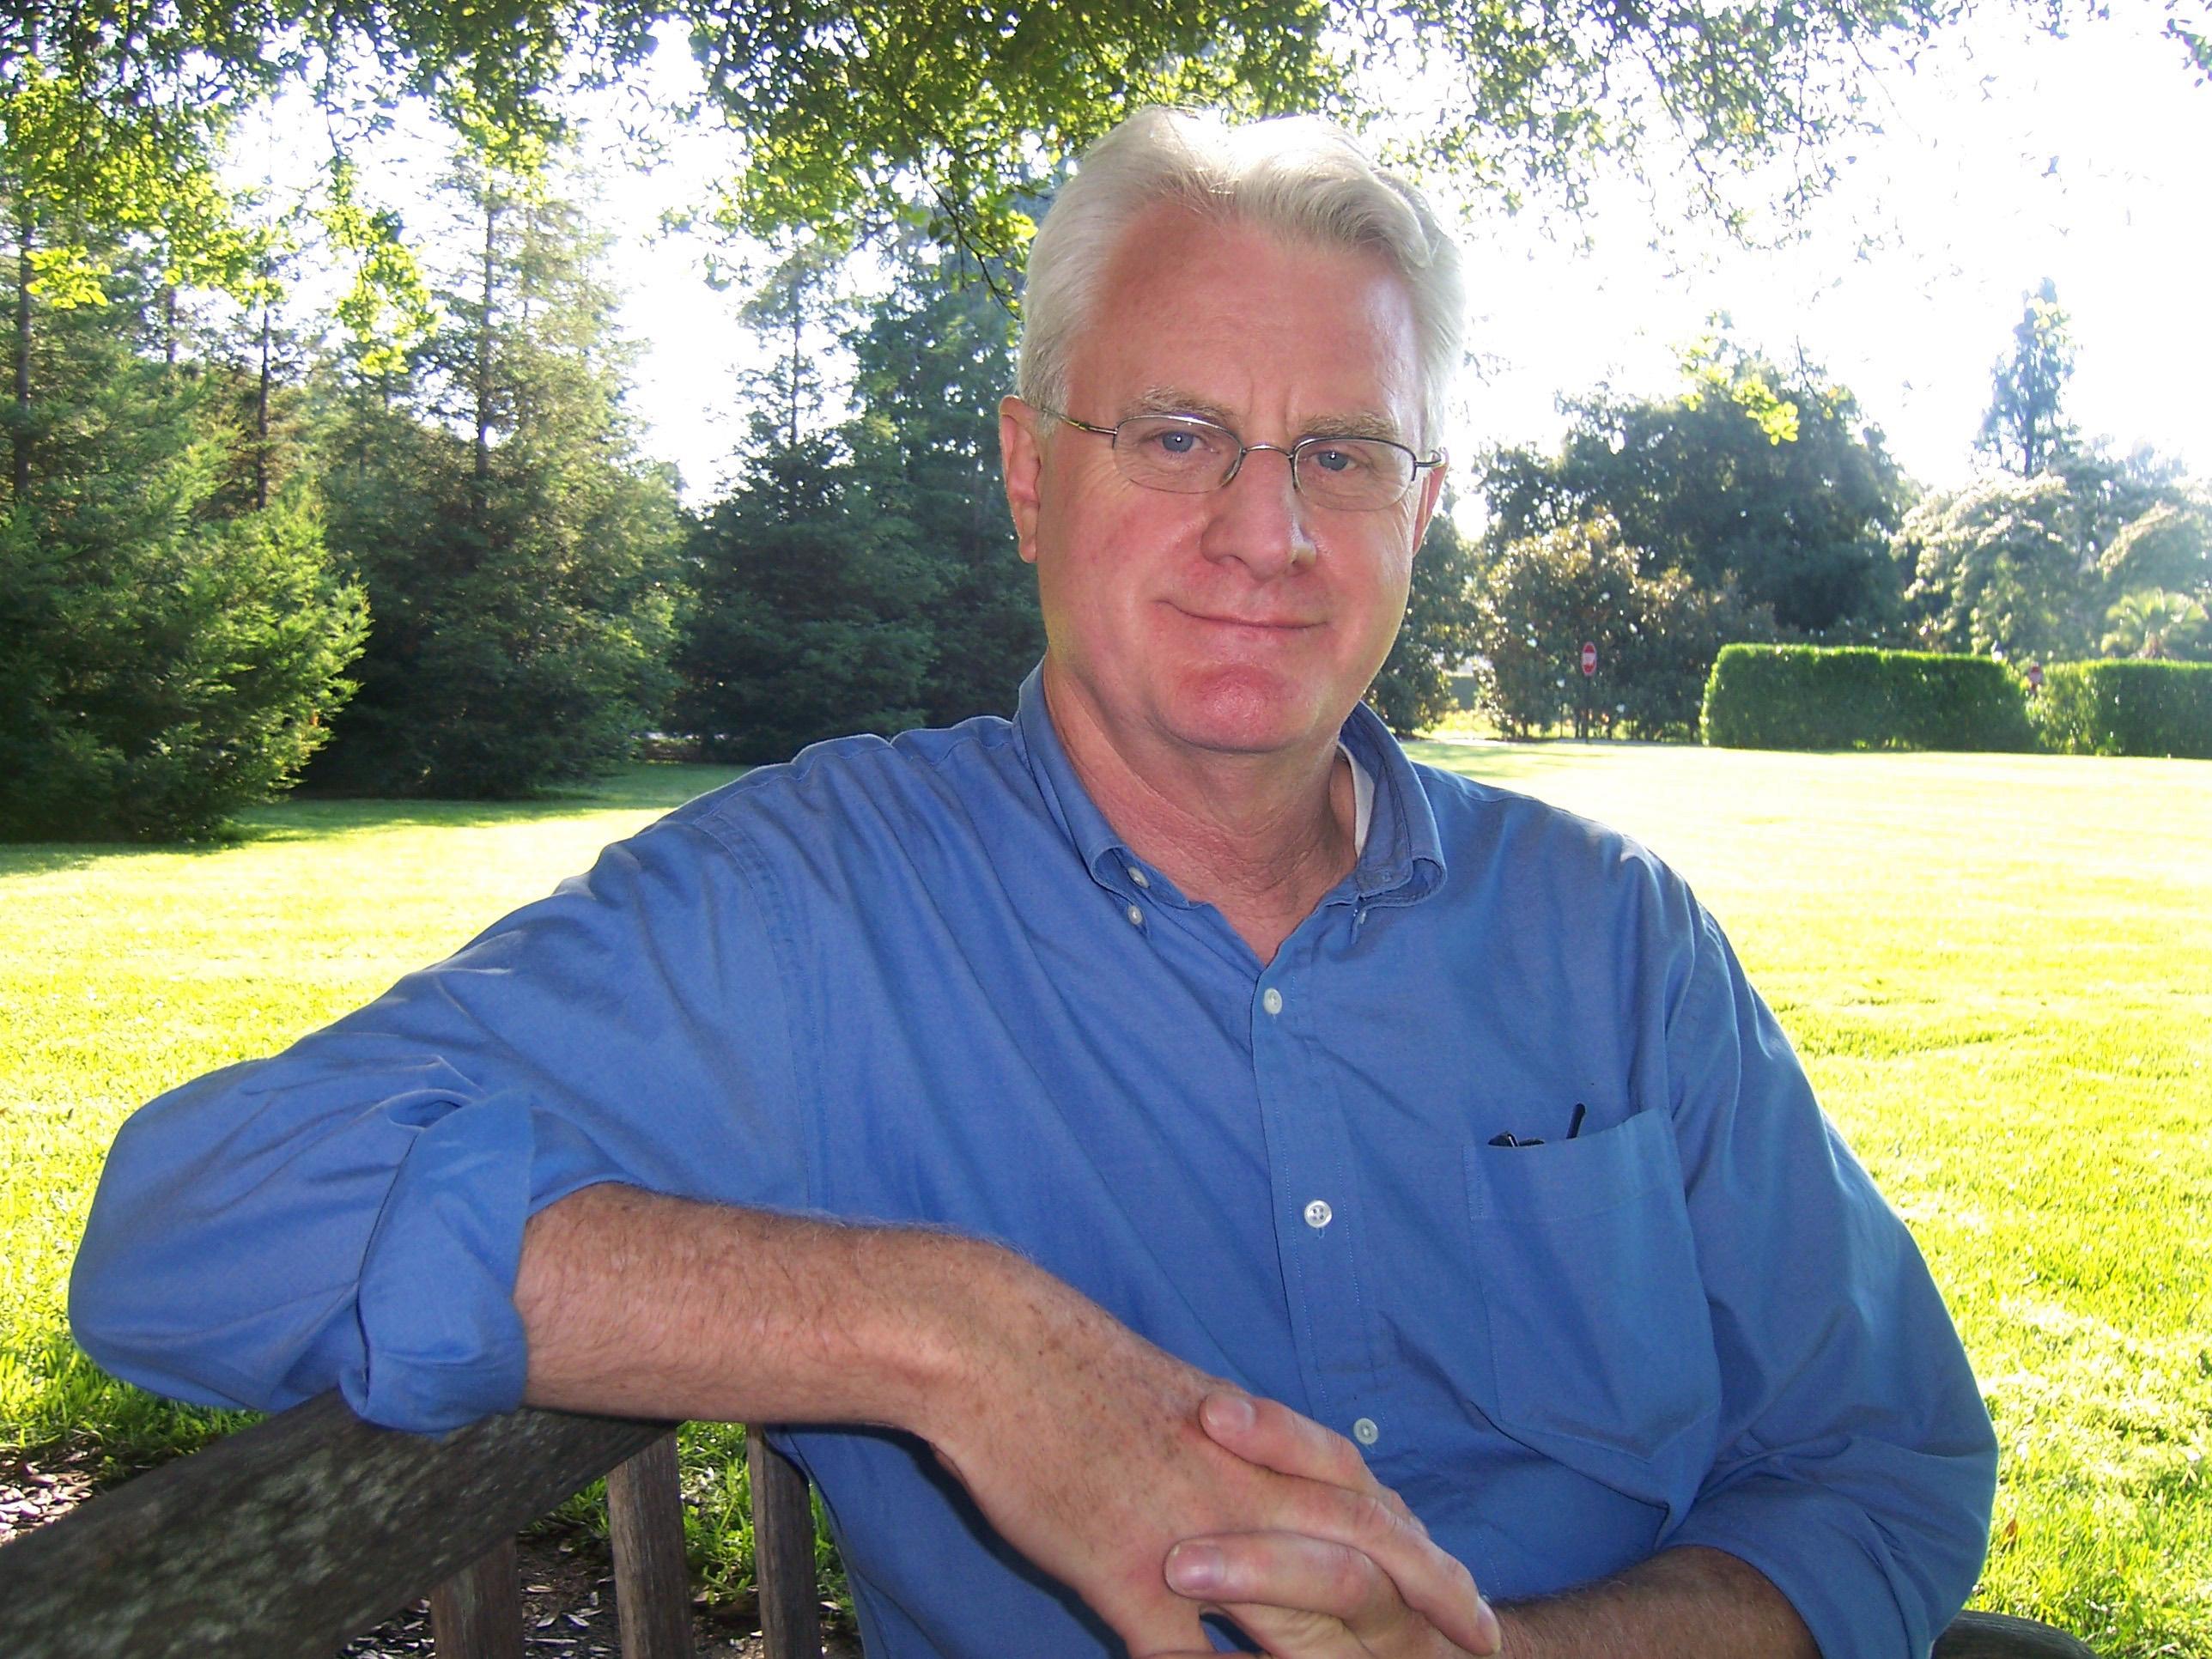 John Frame at The Huntington Library, Art Collection, and Botanical ...